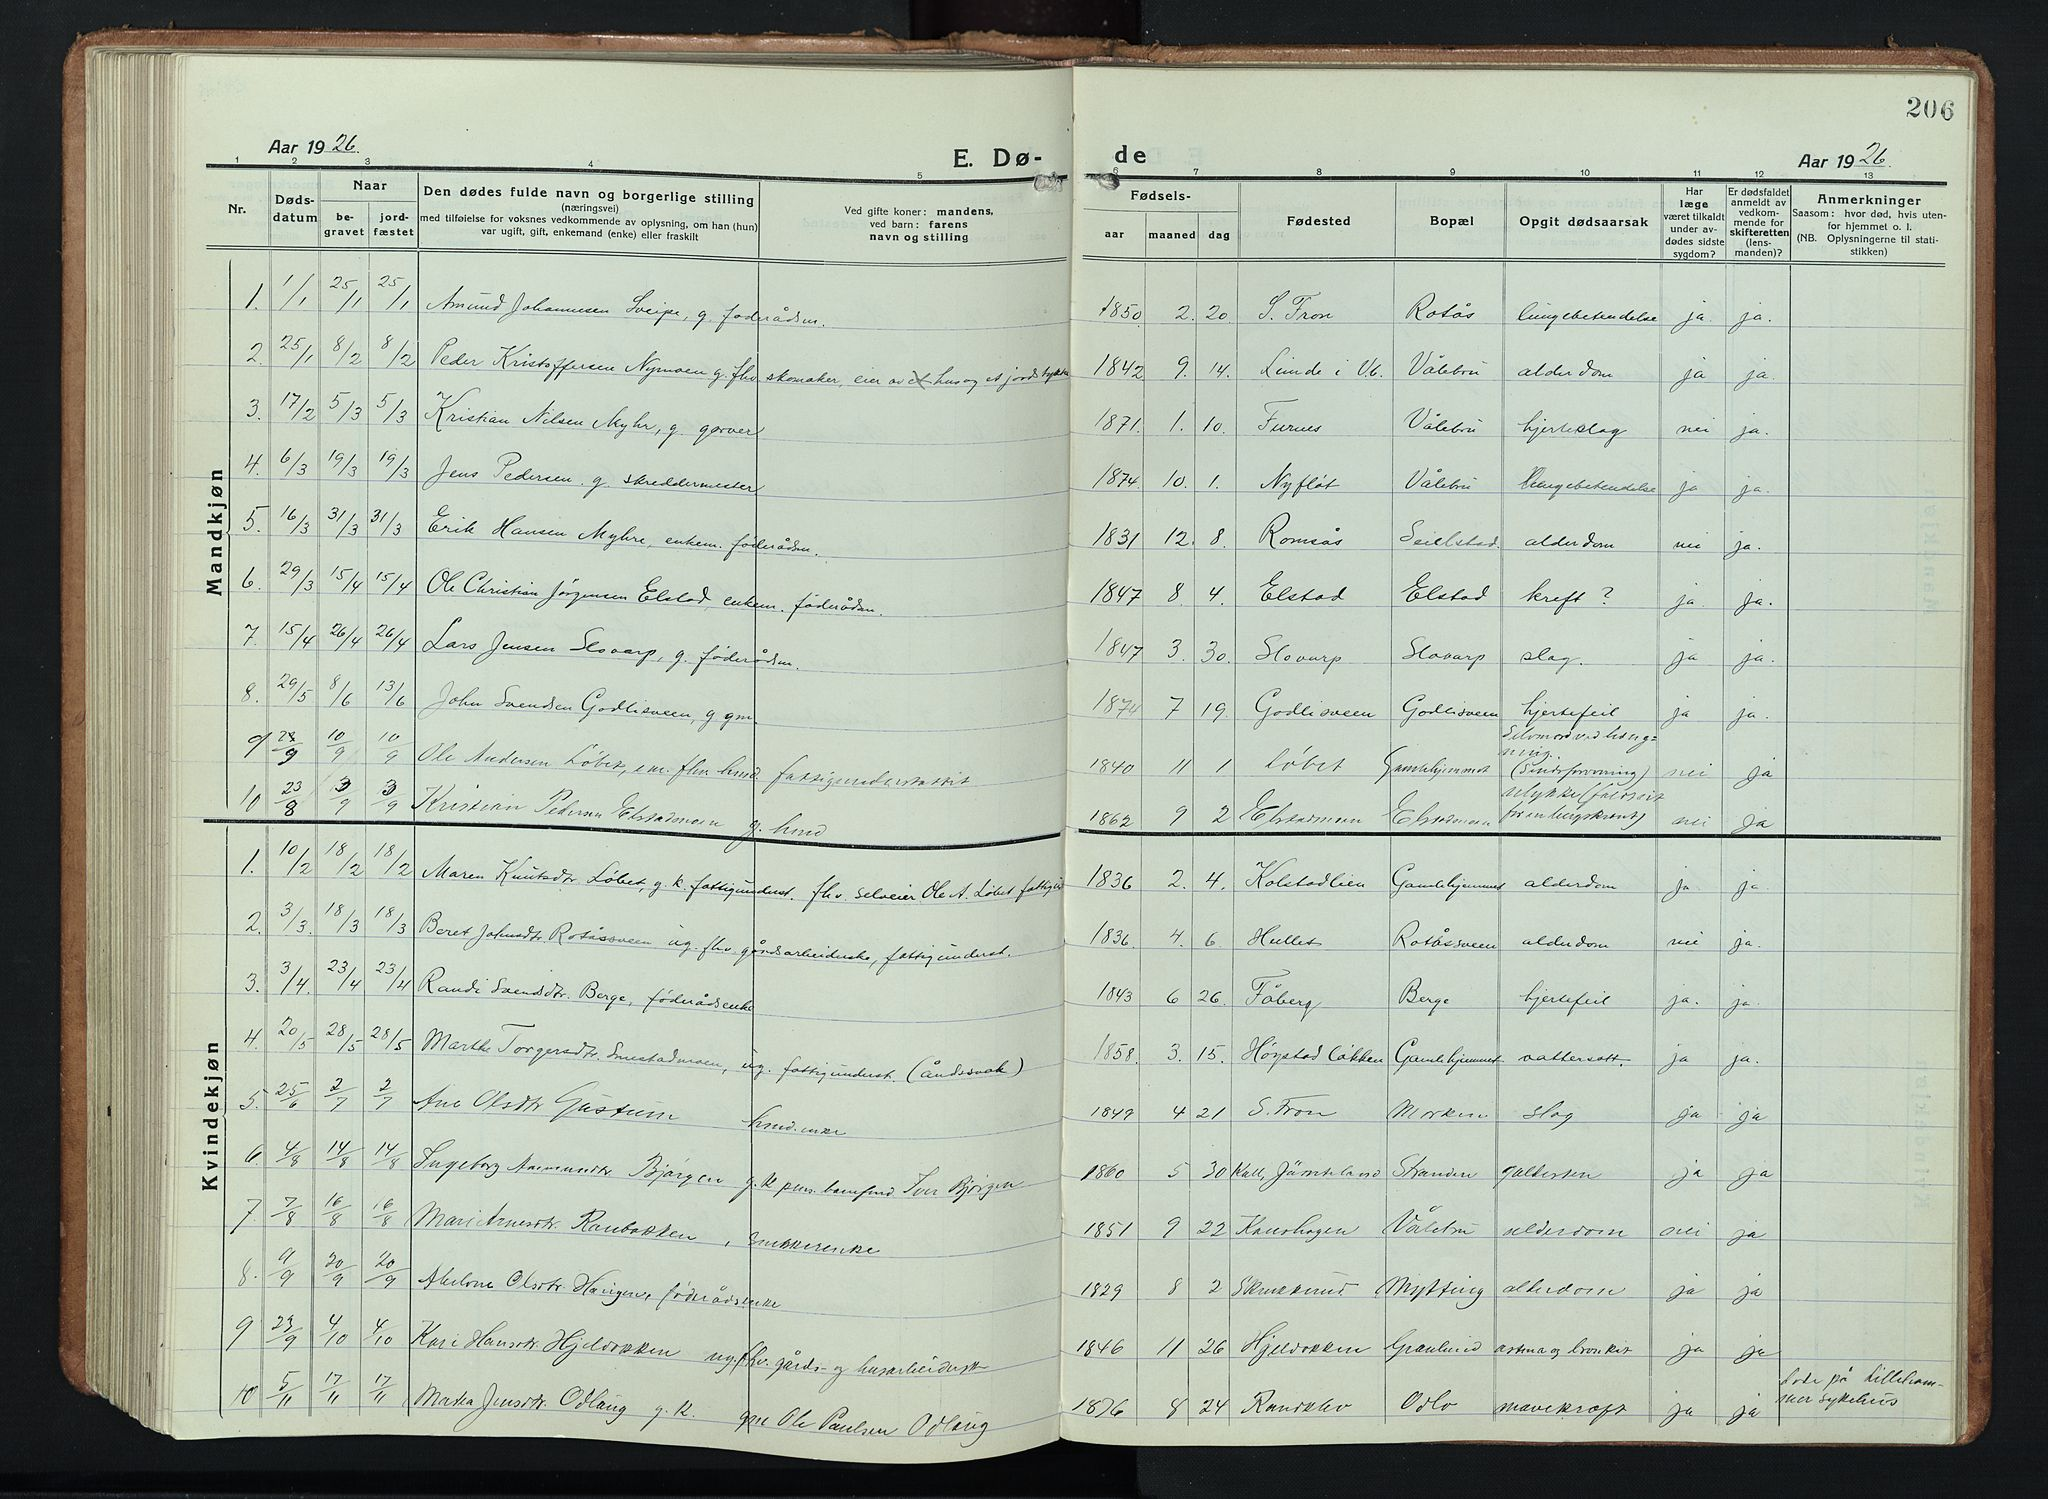 SAH, Ringebu prestekontor, Klokkerbok nr. 11, 1921-1943, s. 206